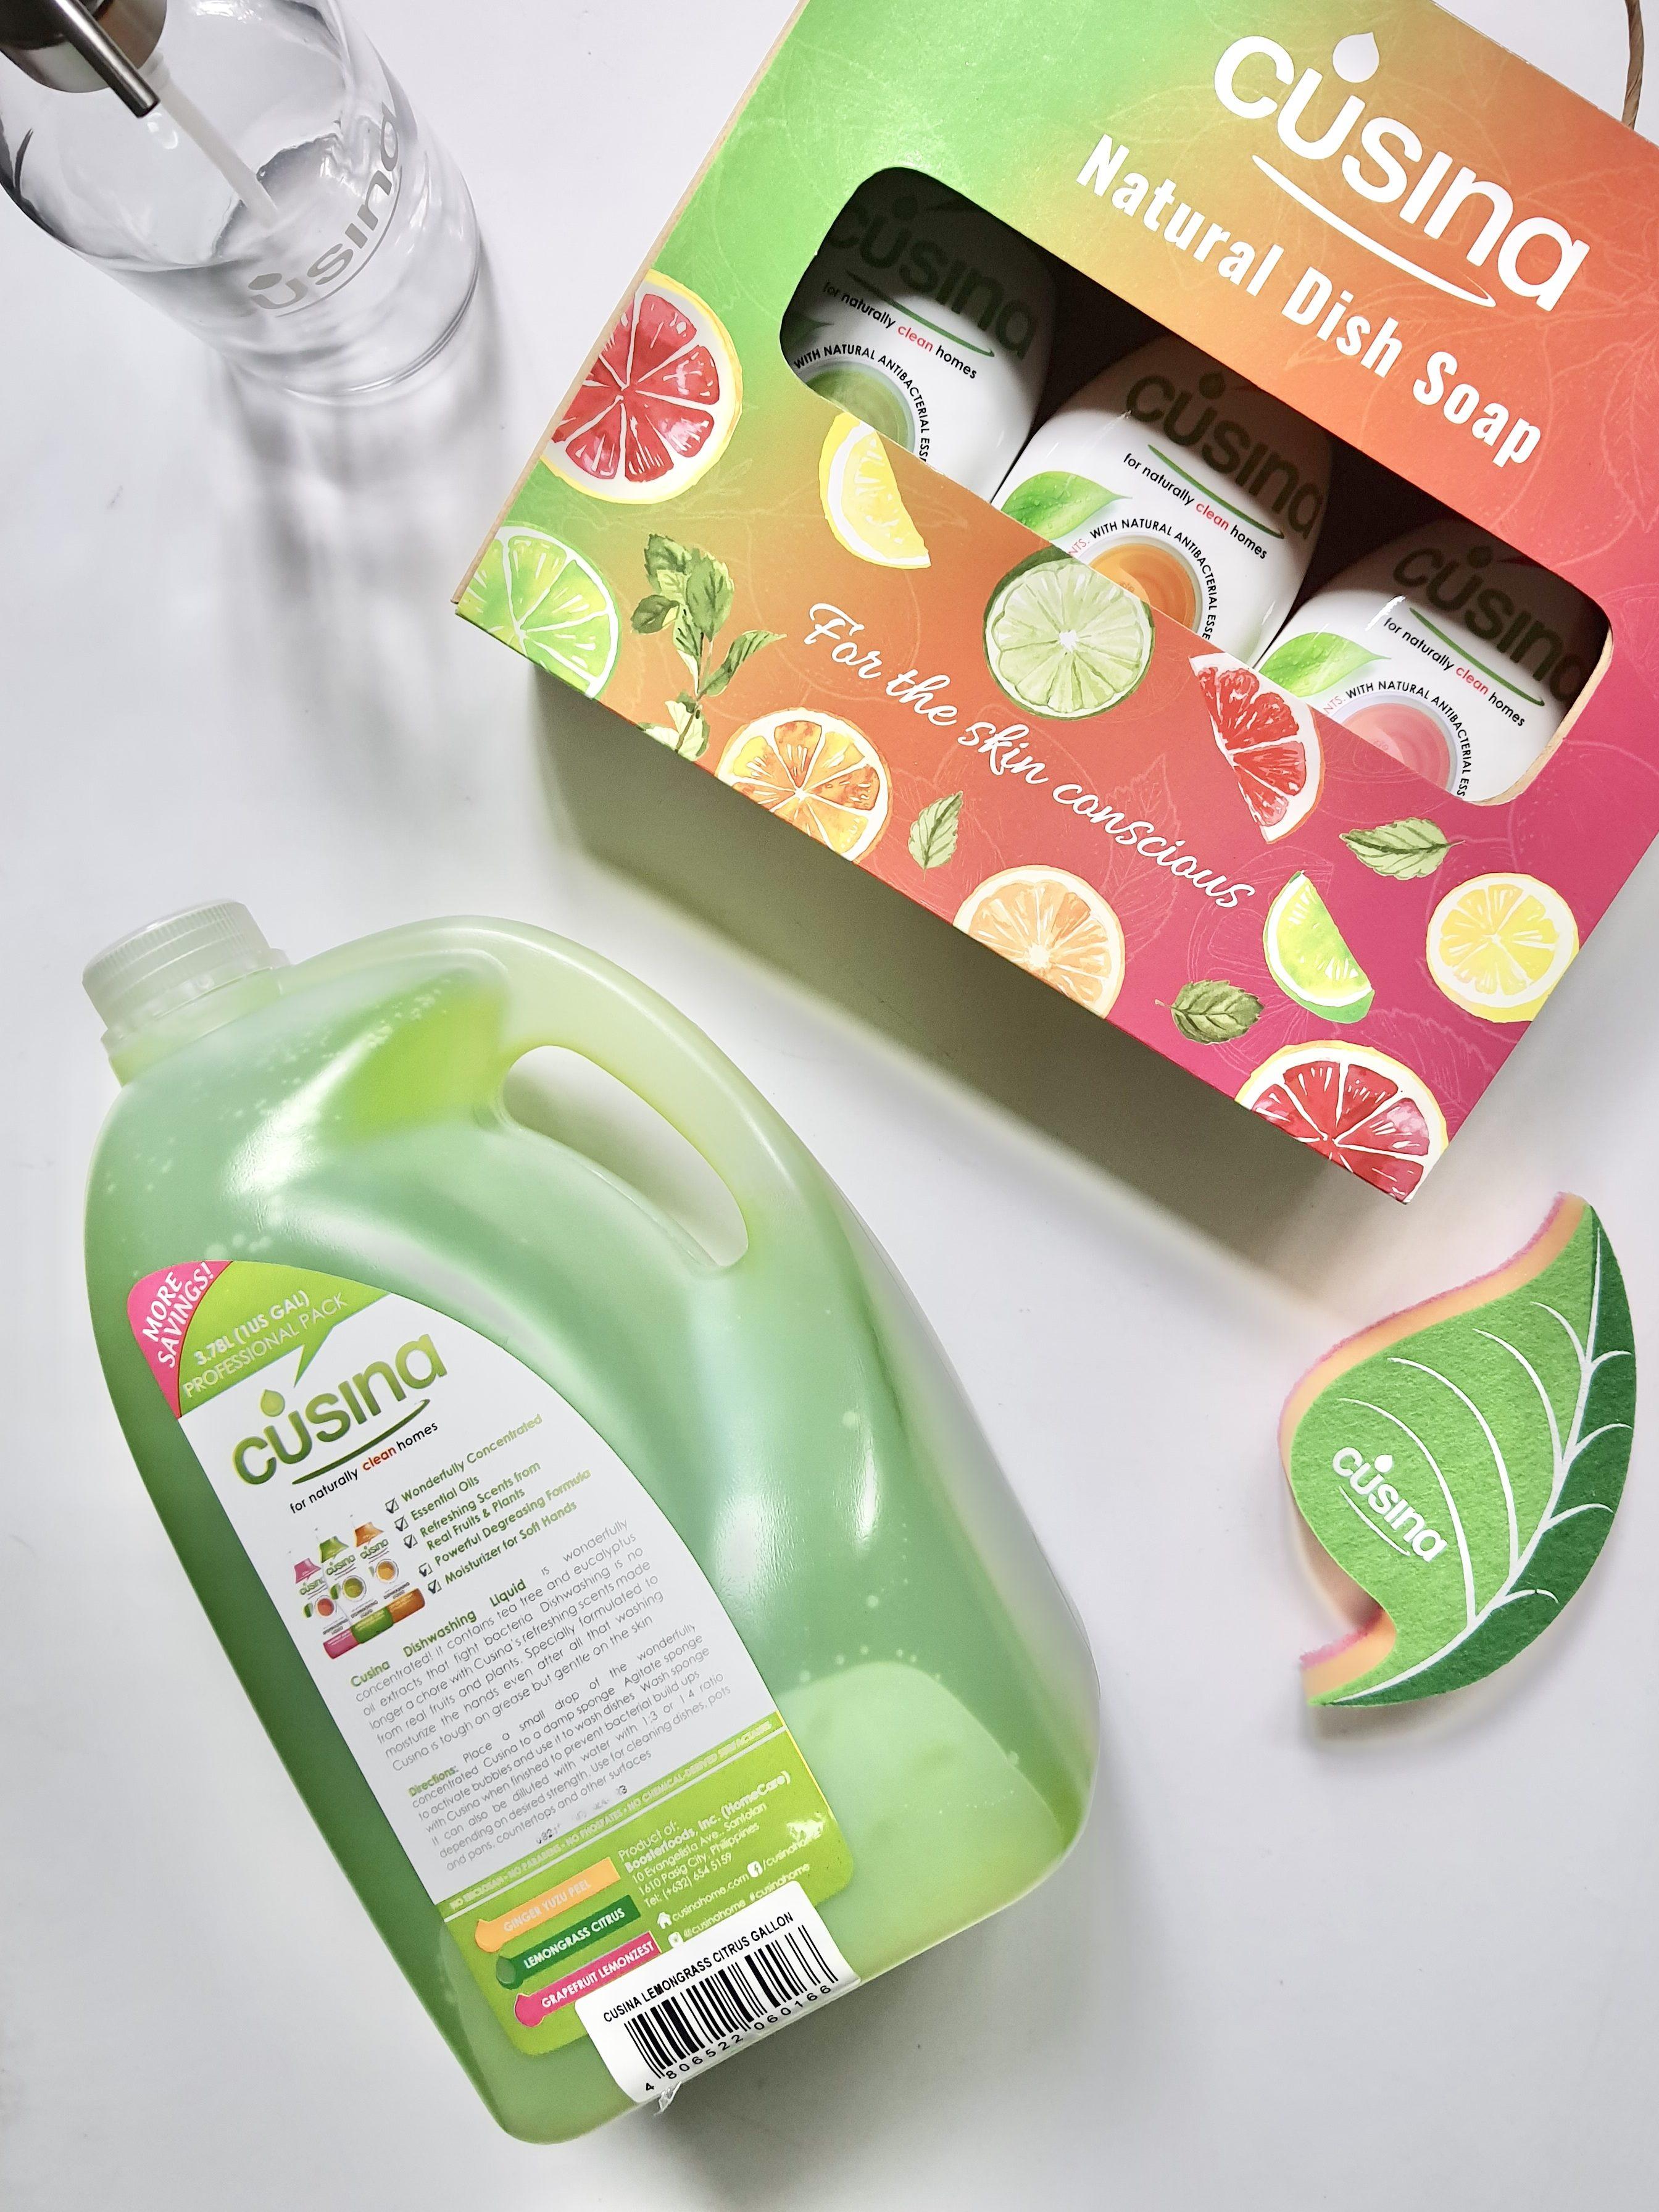 Cusina Natural Dish Soap: For the skin conscious